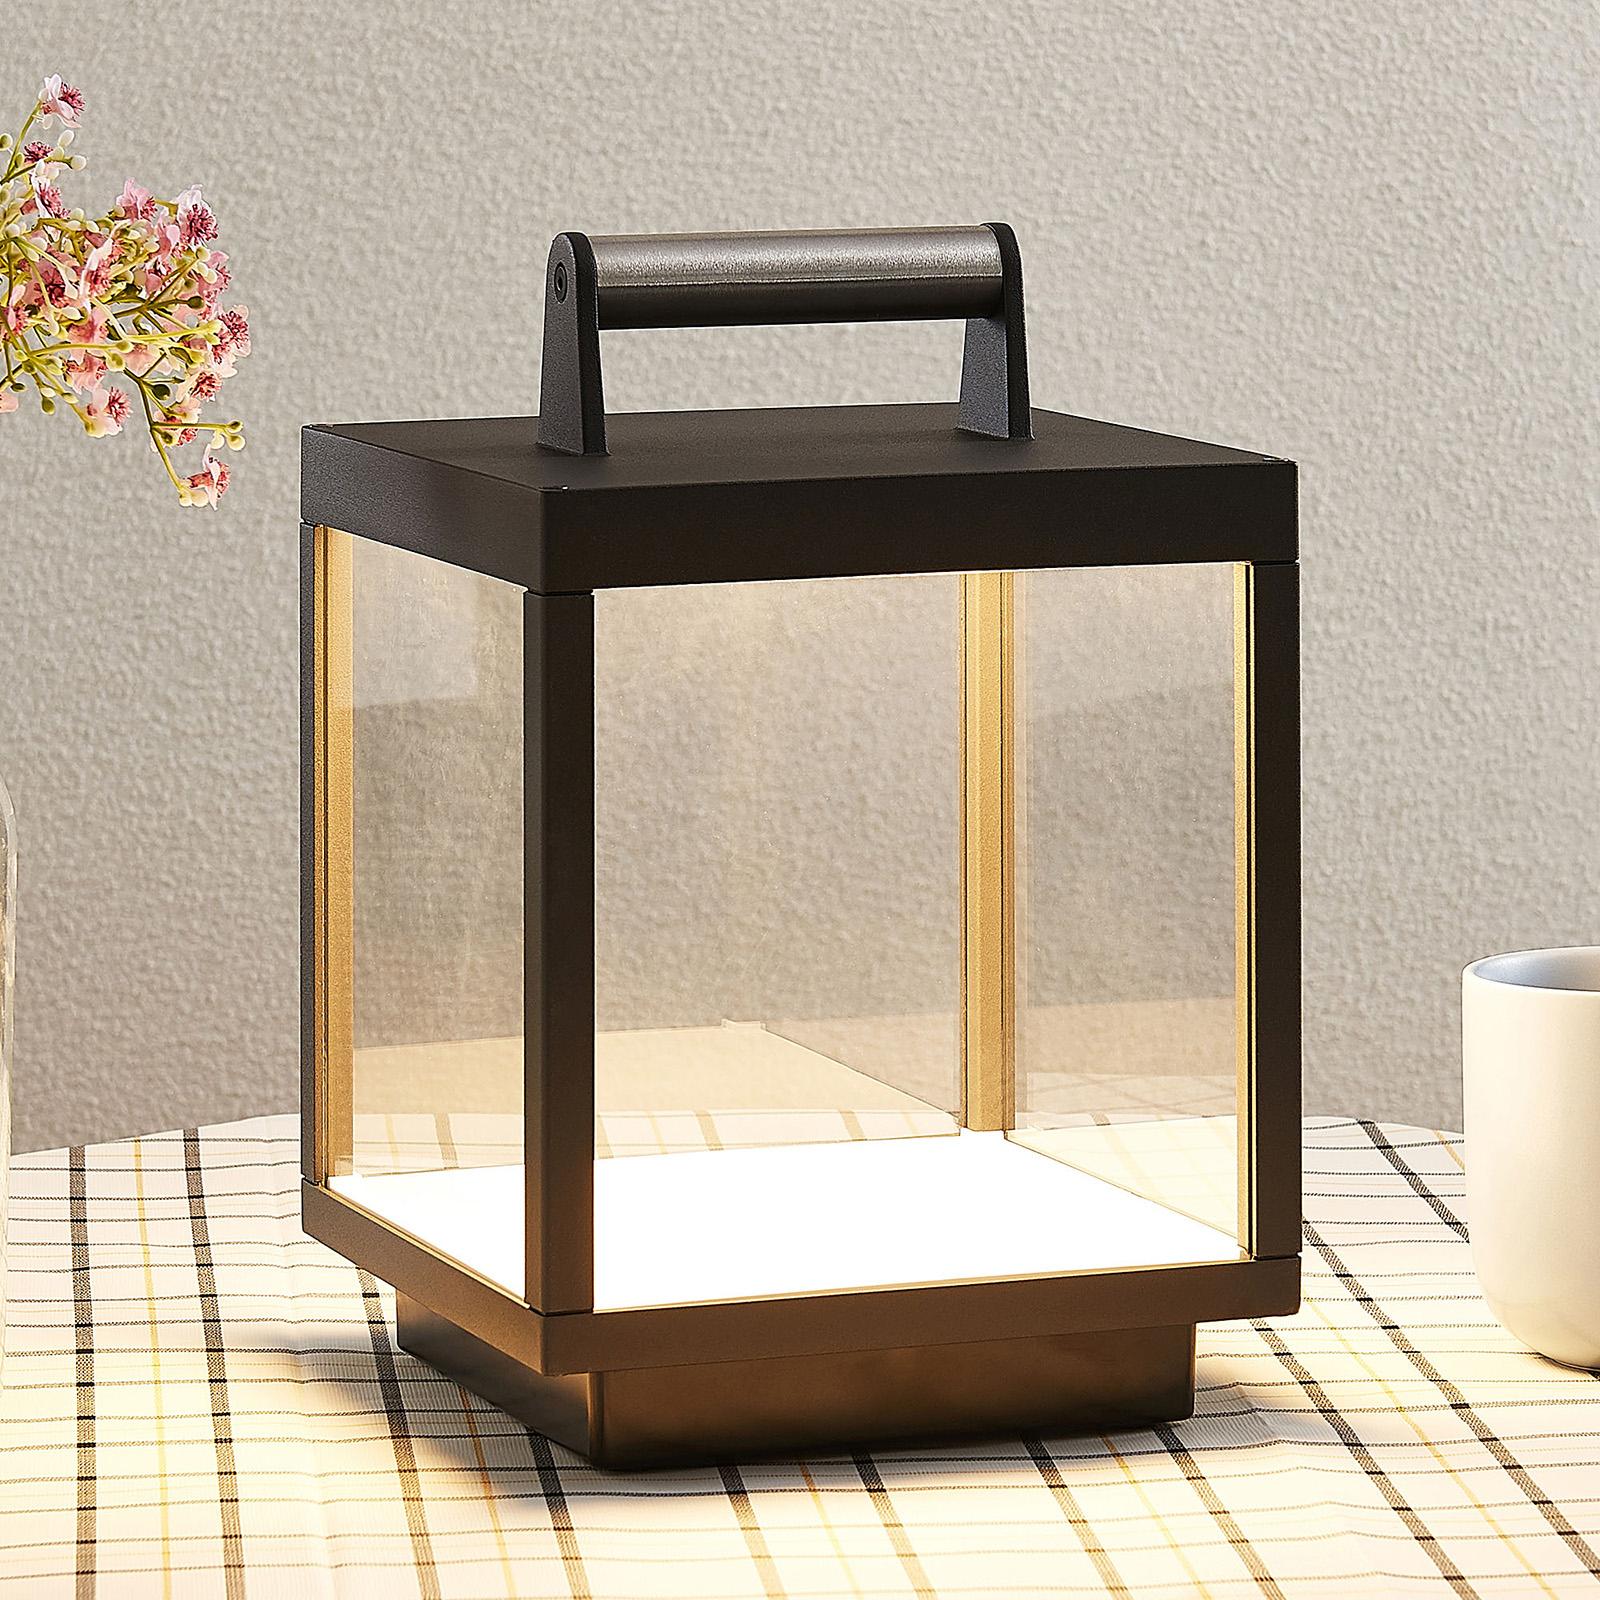 LED-pöytävalaisin Cube ulos, ladattava